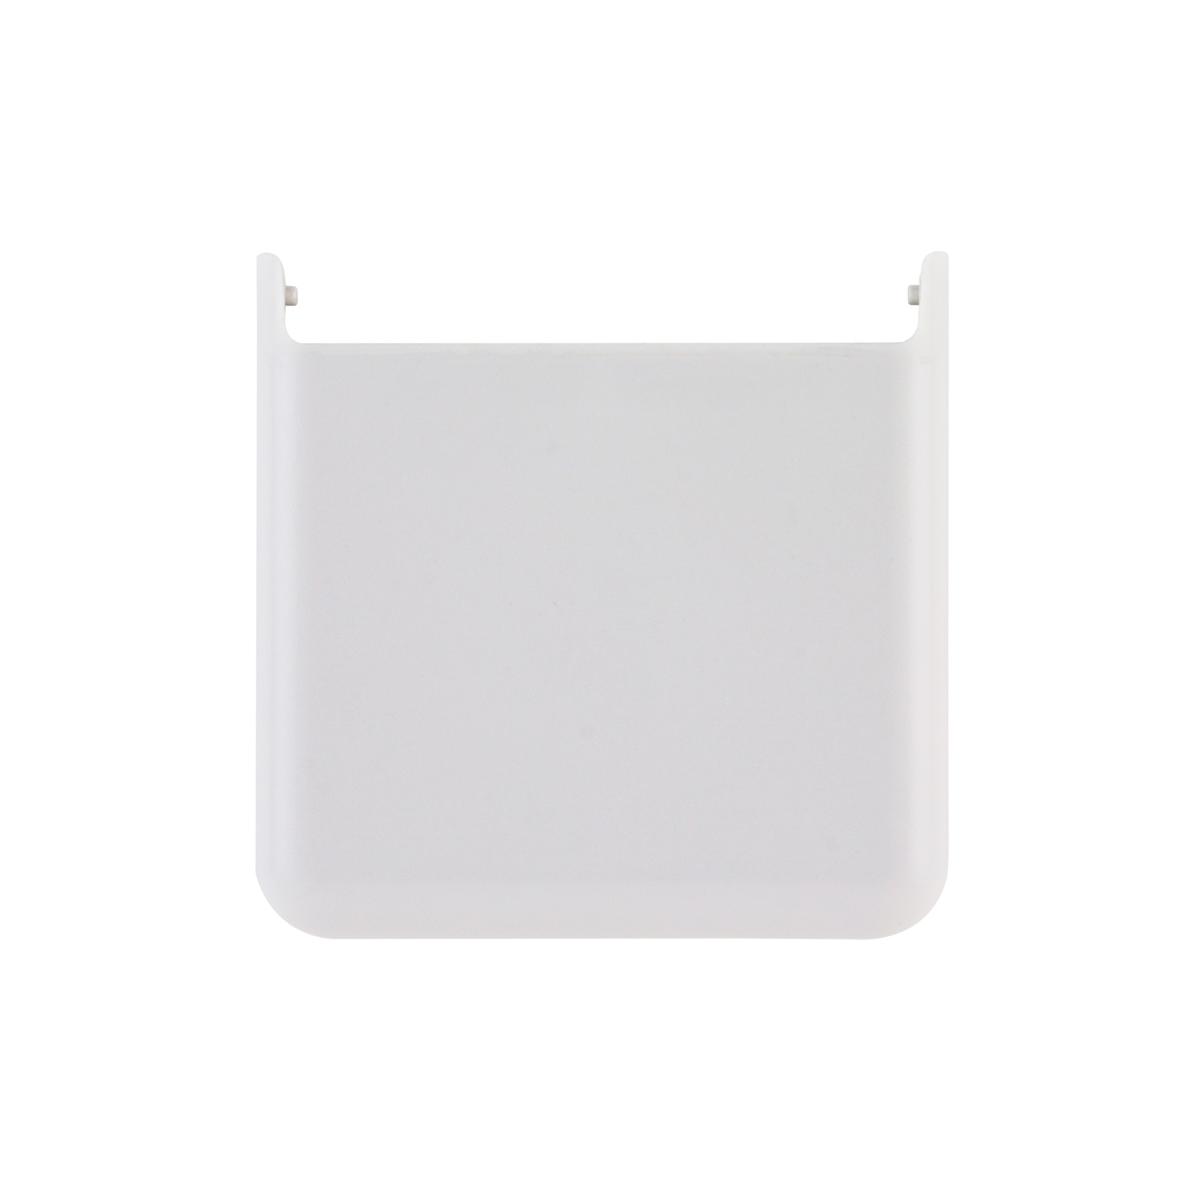 Philips IntelliVue MX40 Wearable Patient Monitor Battery Door Cover Replacement